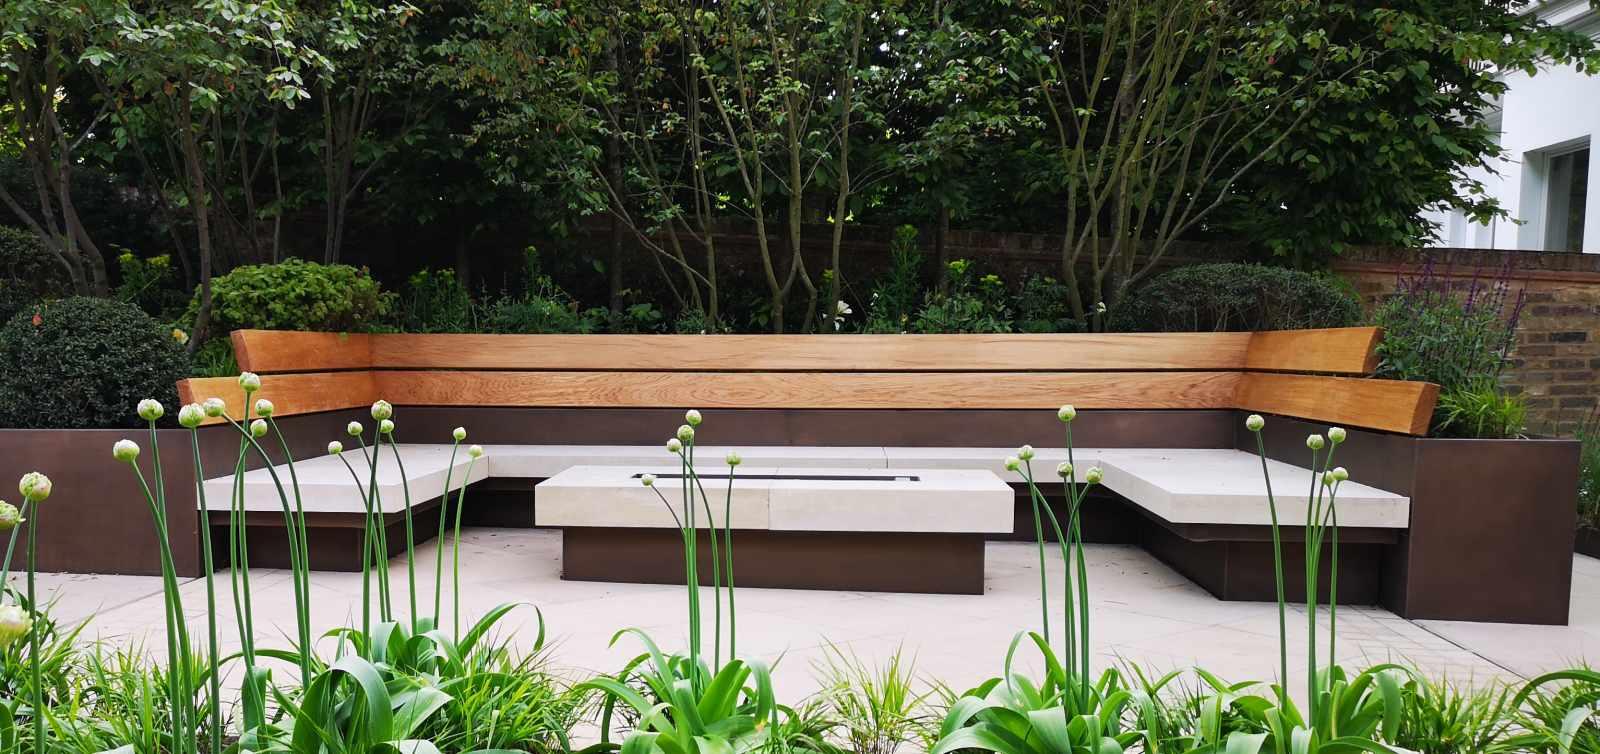 Outstanding Contemporary Wooden Garden Features Essex Uk The Garden Beatyapartments Chair Design Images Beatyapartmentscom